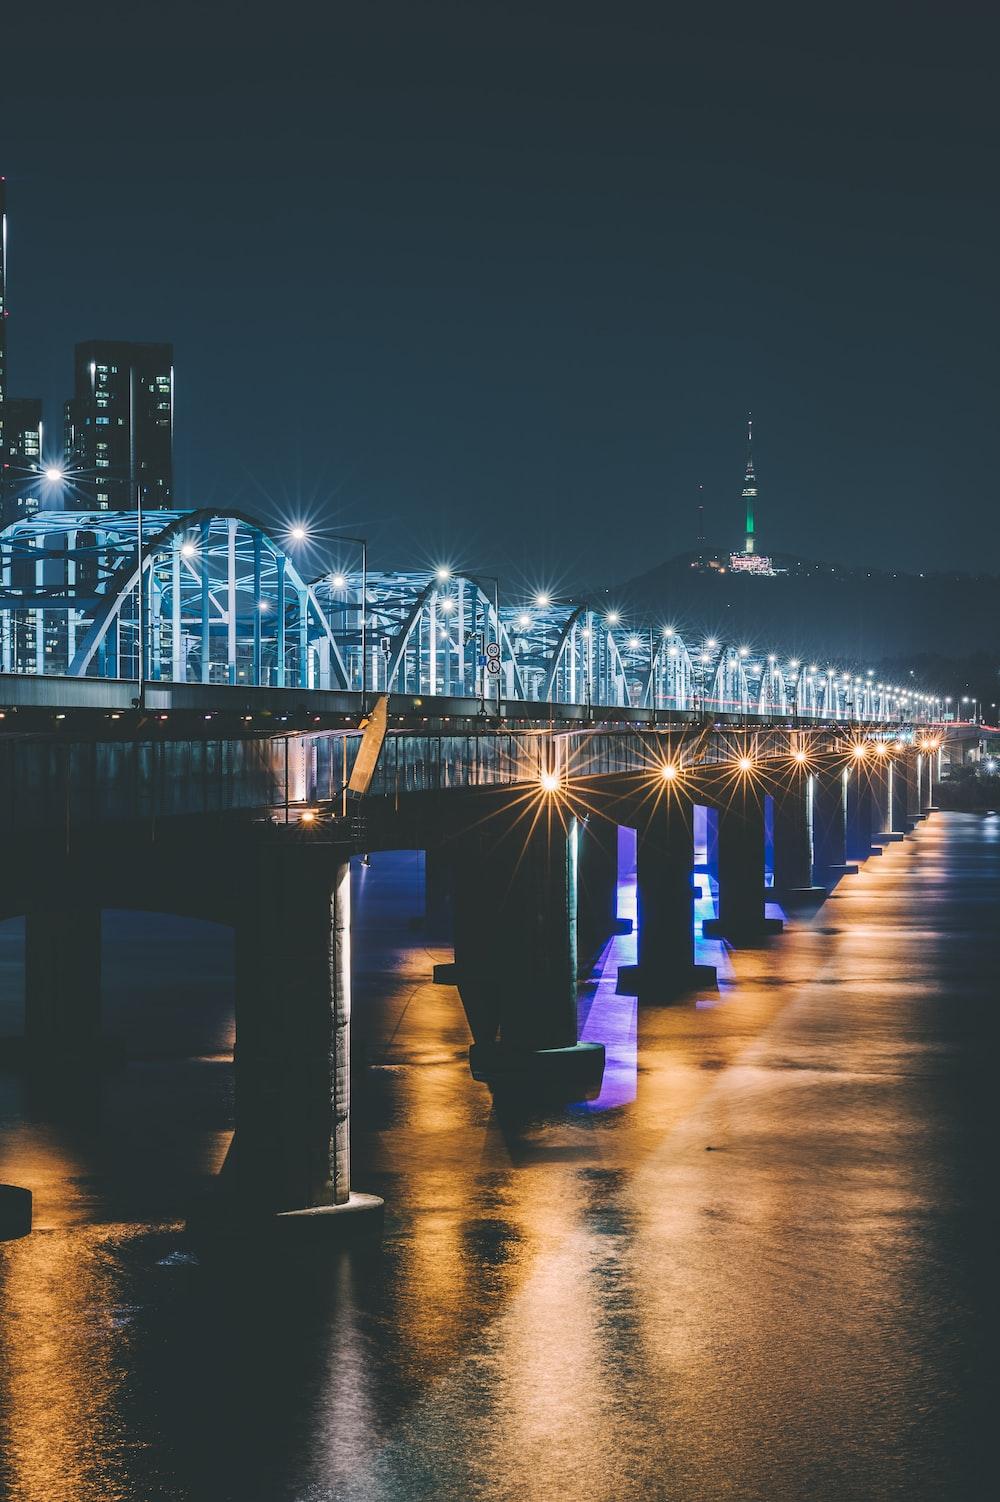 lighted bridge at night time